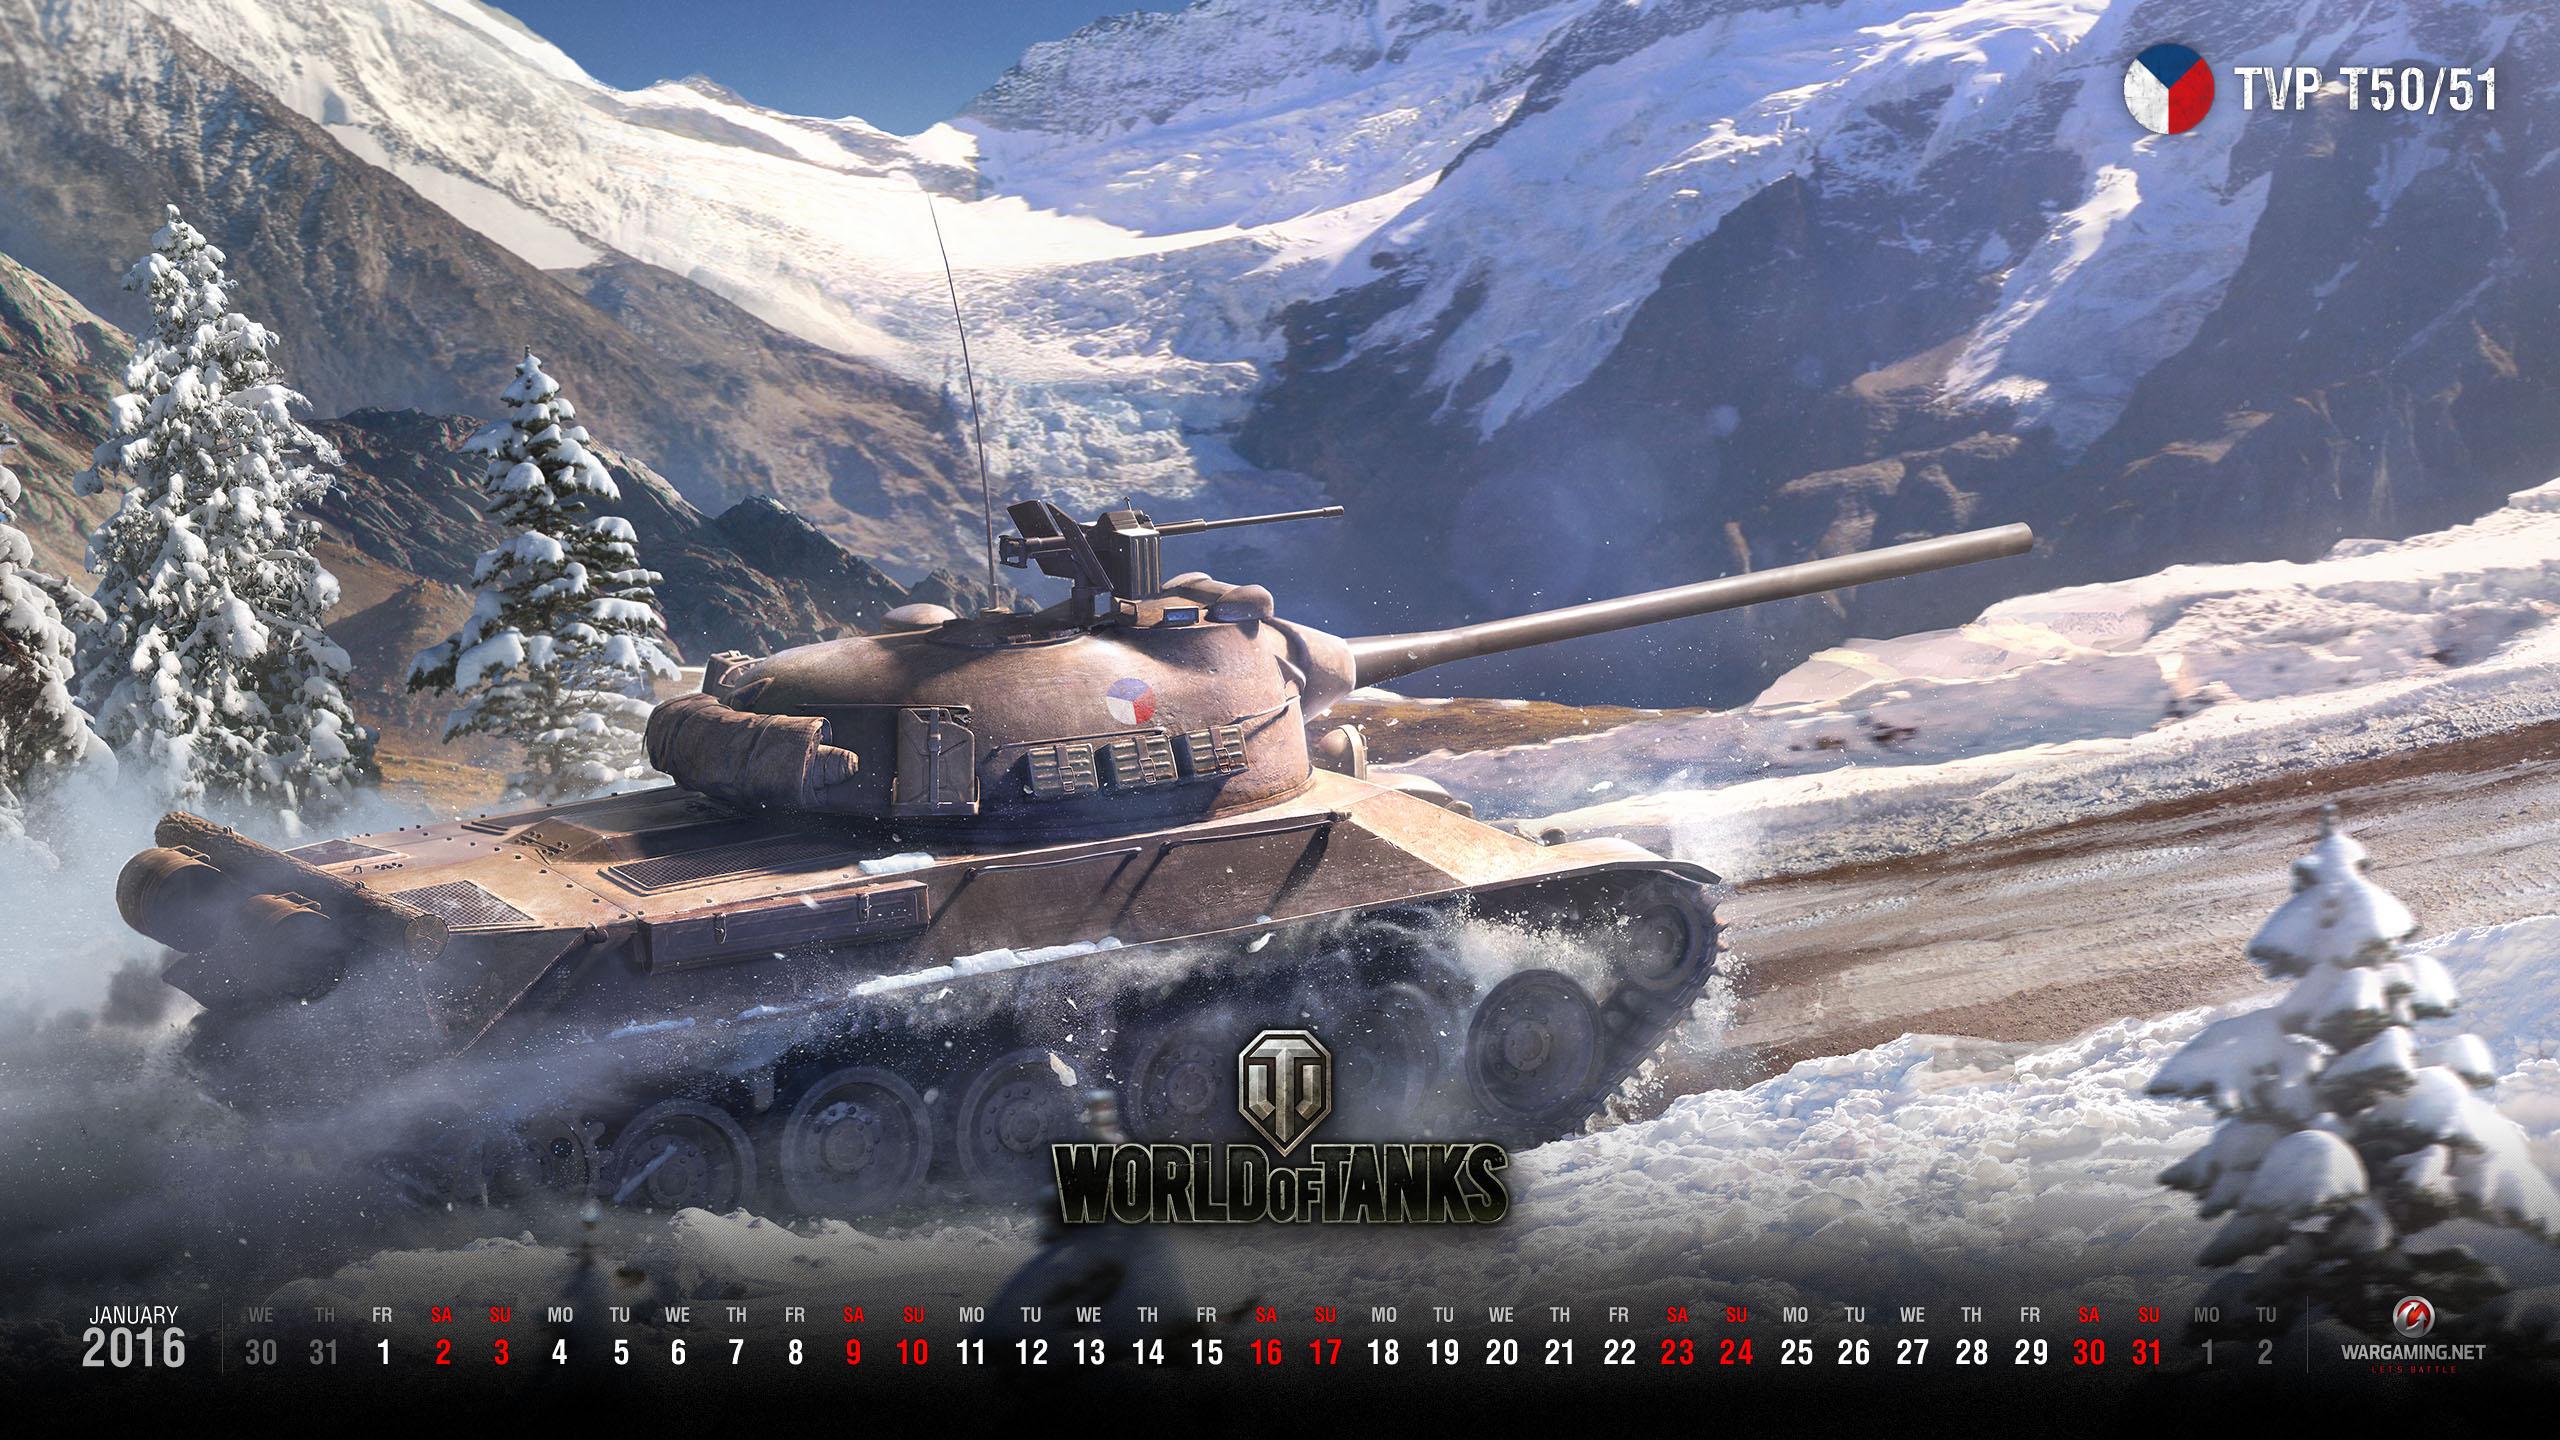 Wallpaper For January 2016 General News World Of Tanks